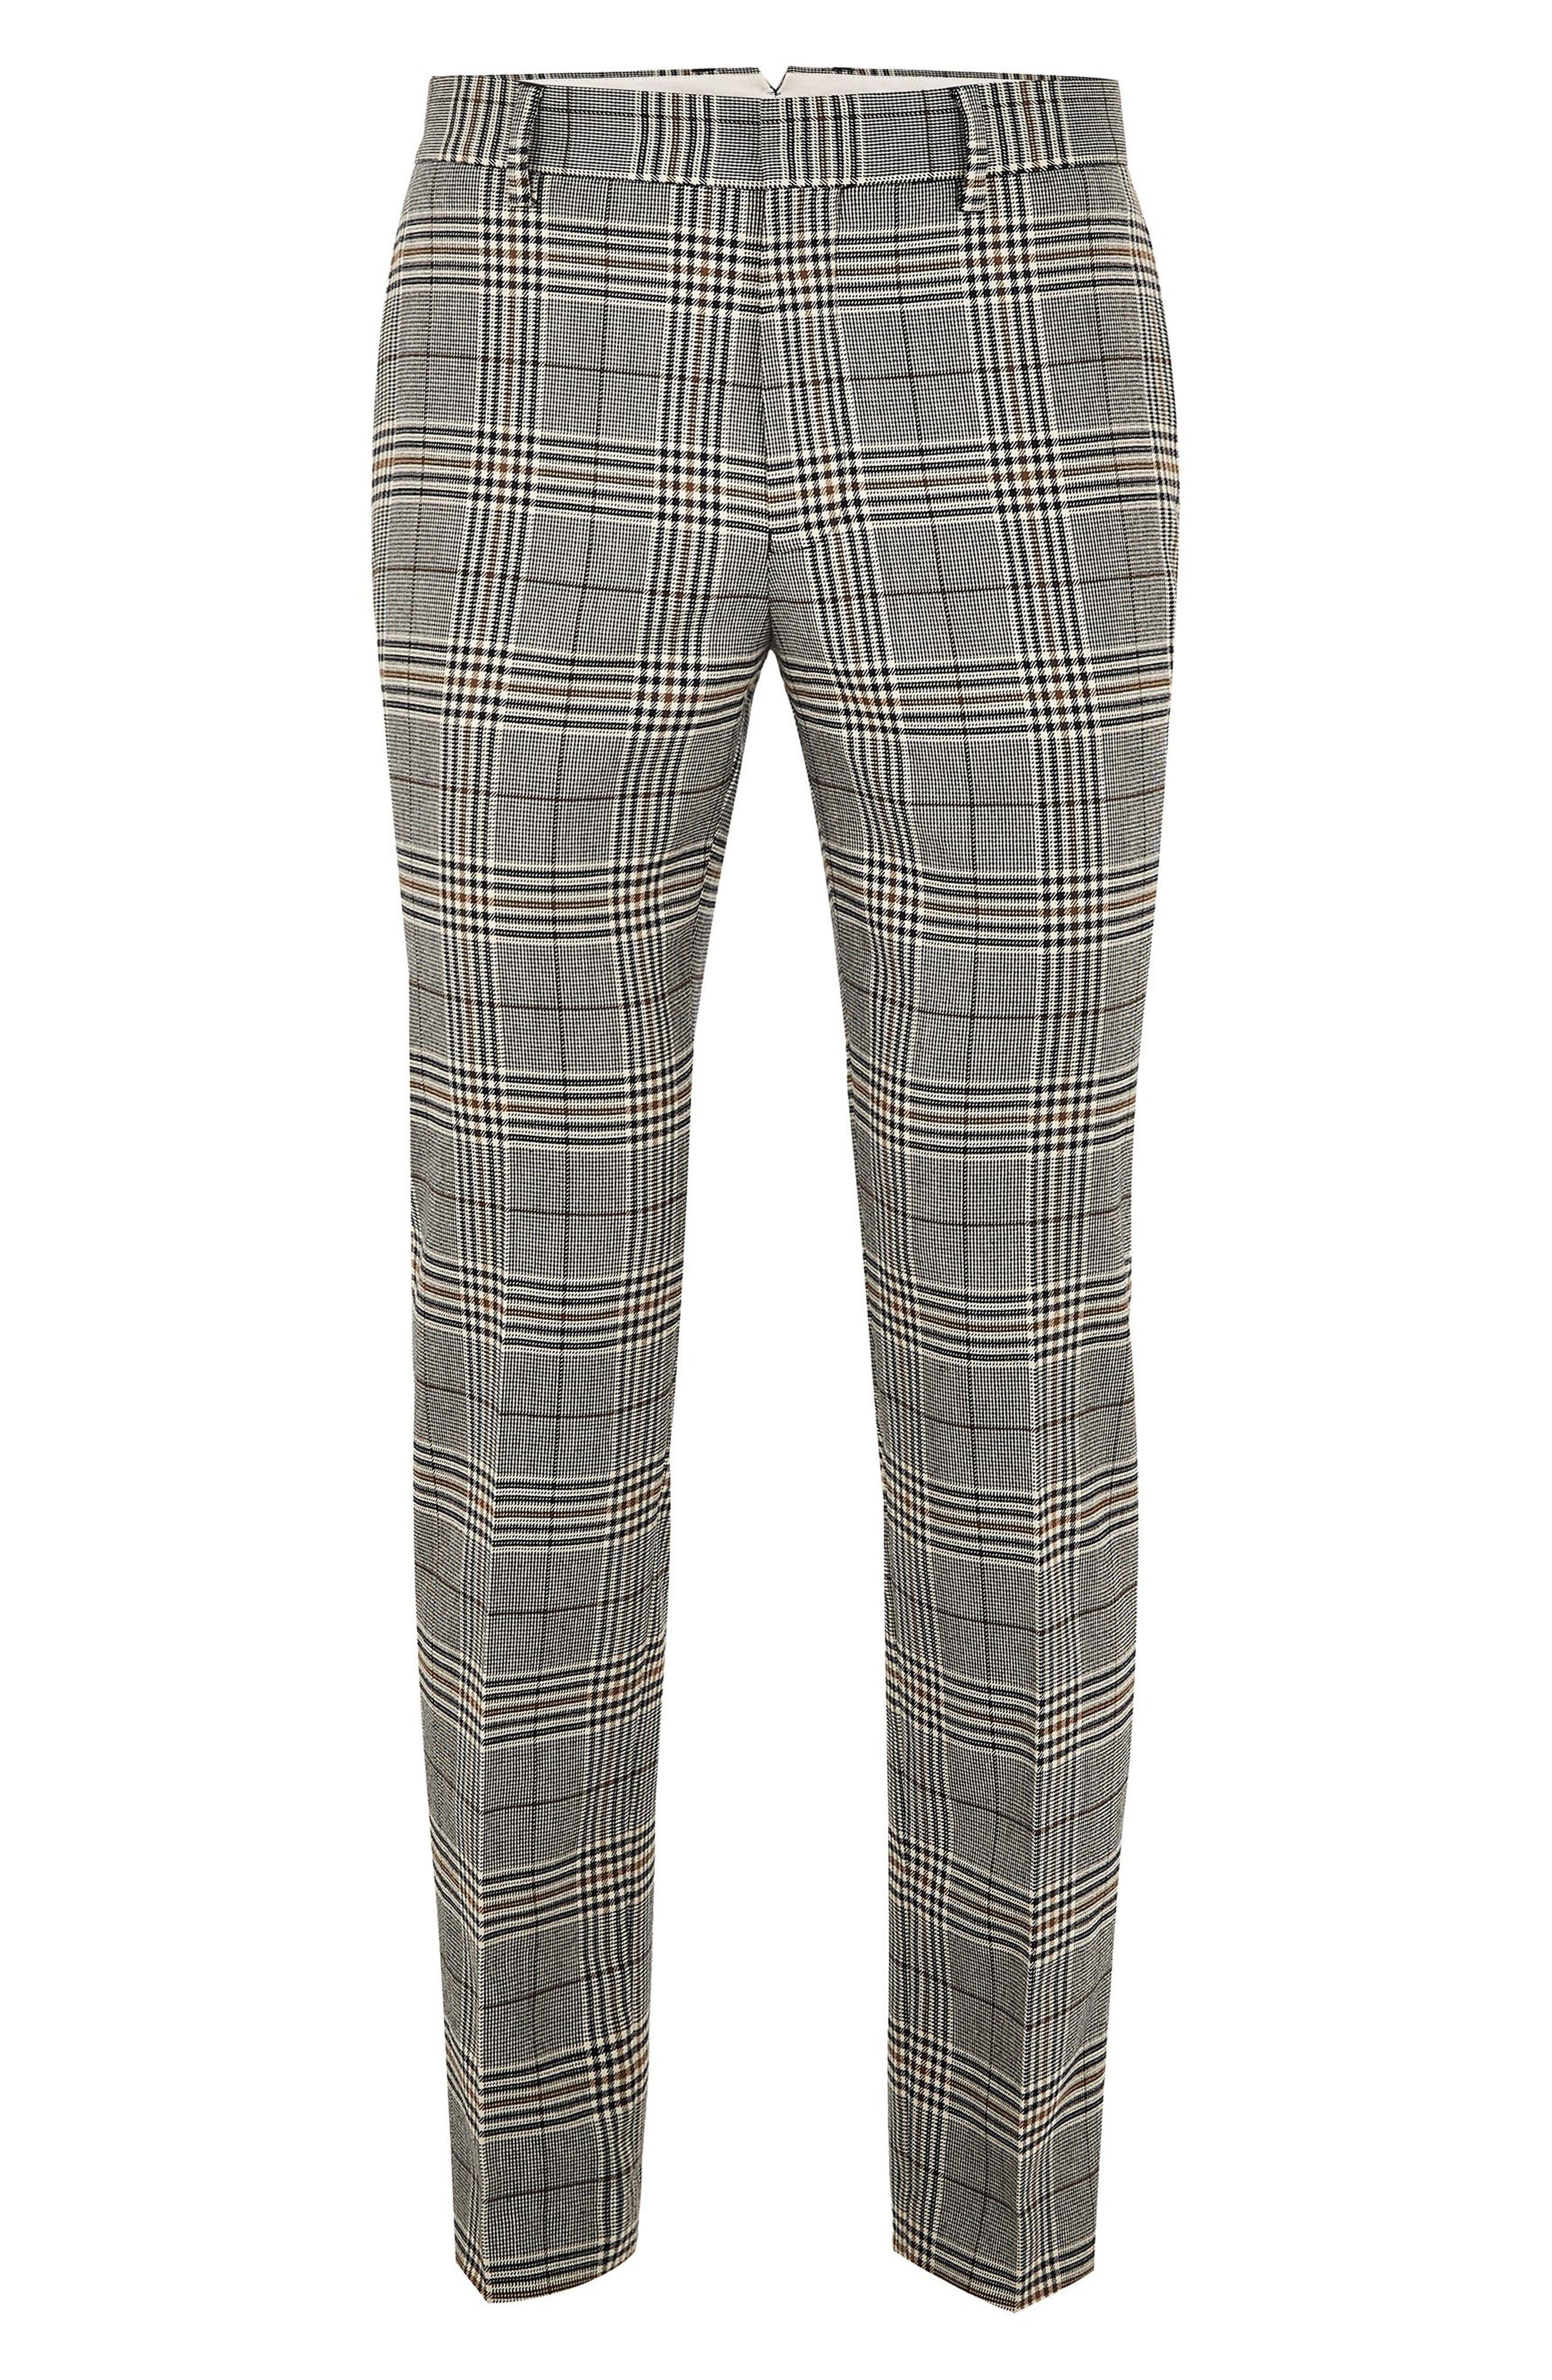 Dapple Check Skinny Trousers,                             Main thumbnail 1, color,                             STONE MULTI